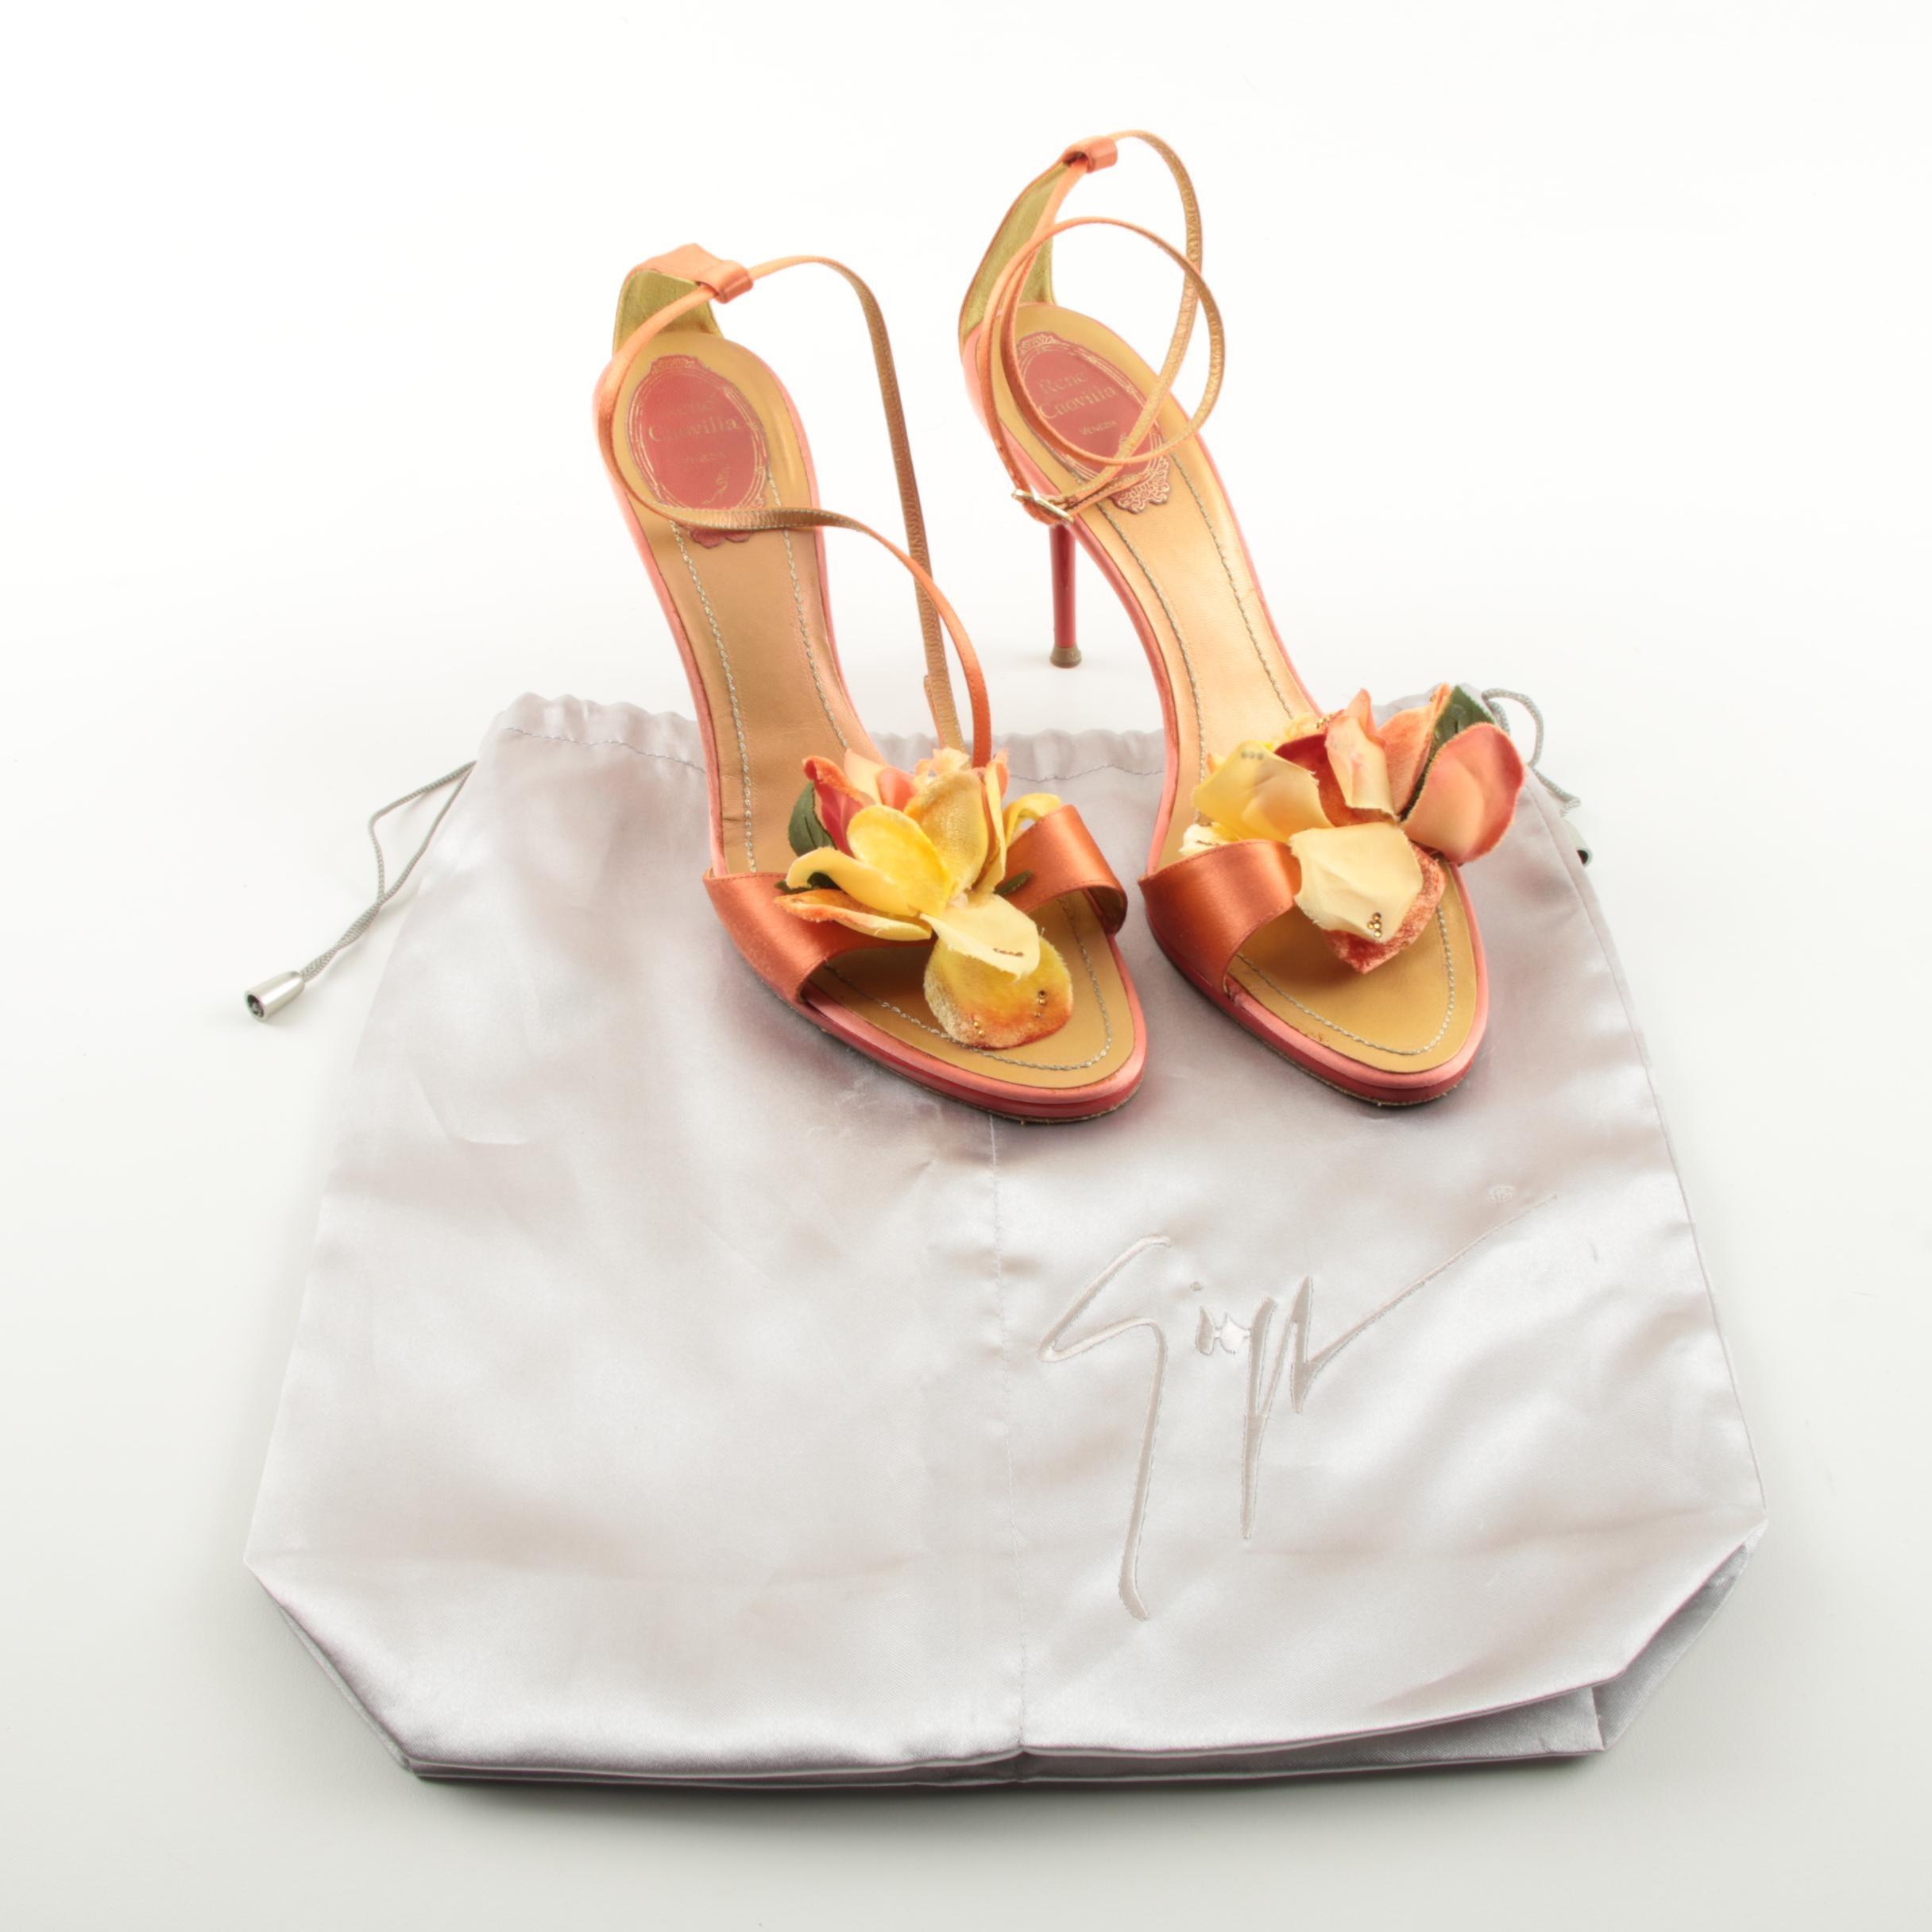 Rene Caovilla Tangerine Silk and Floral Stiletto High Heels